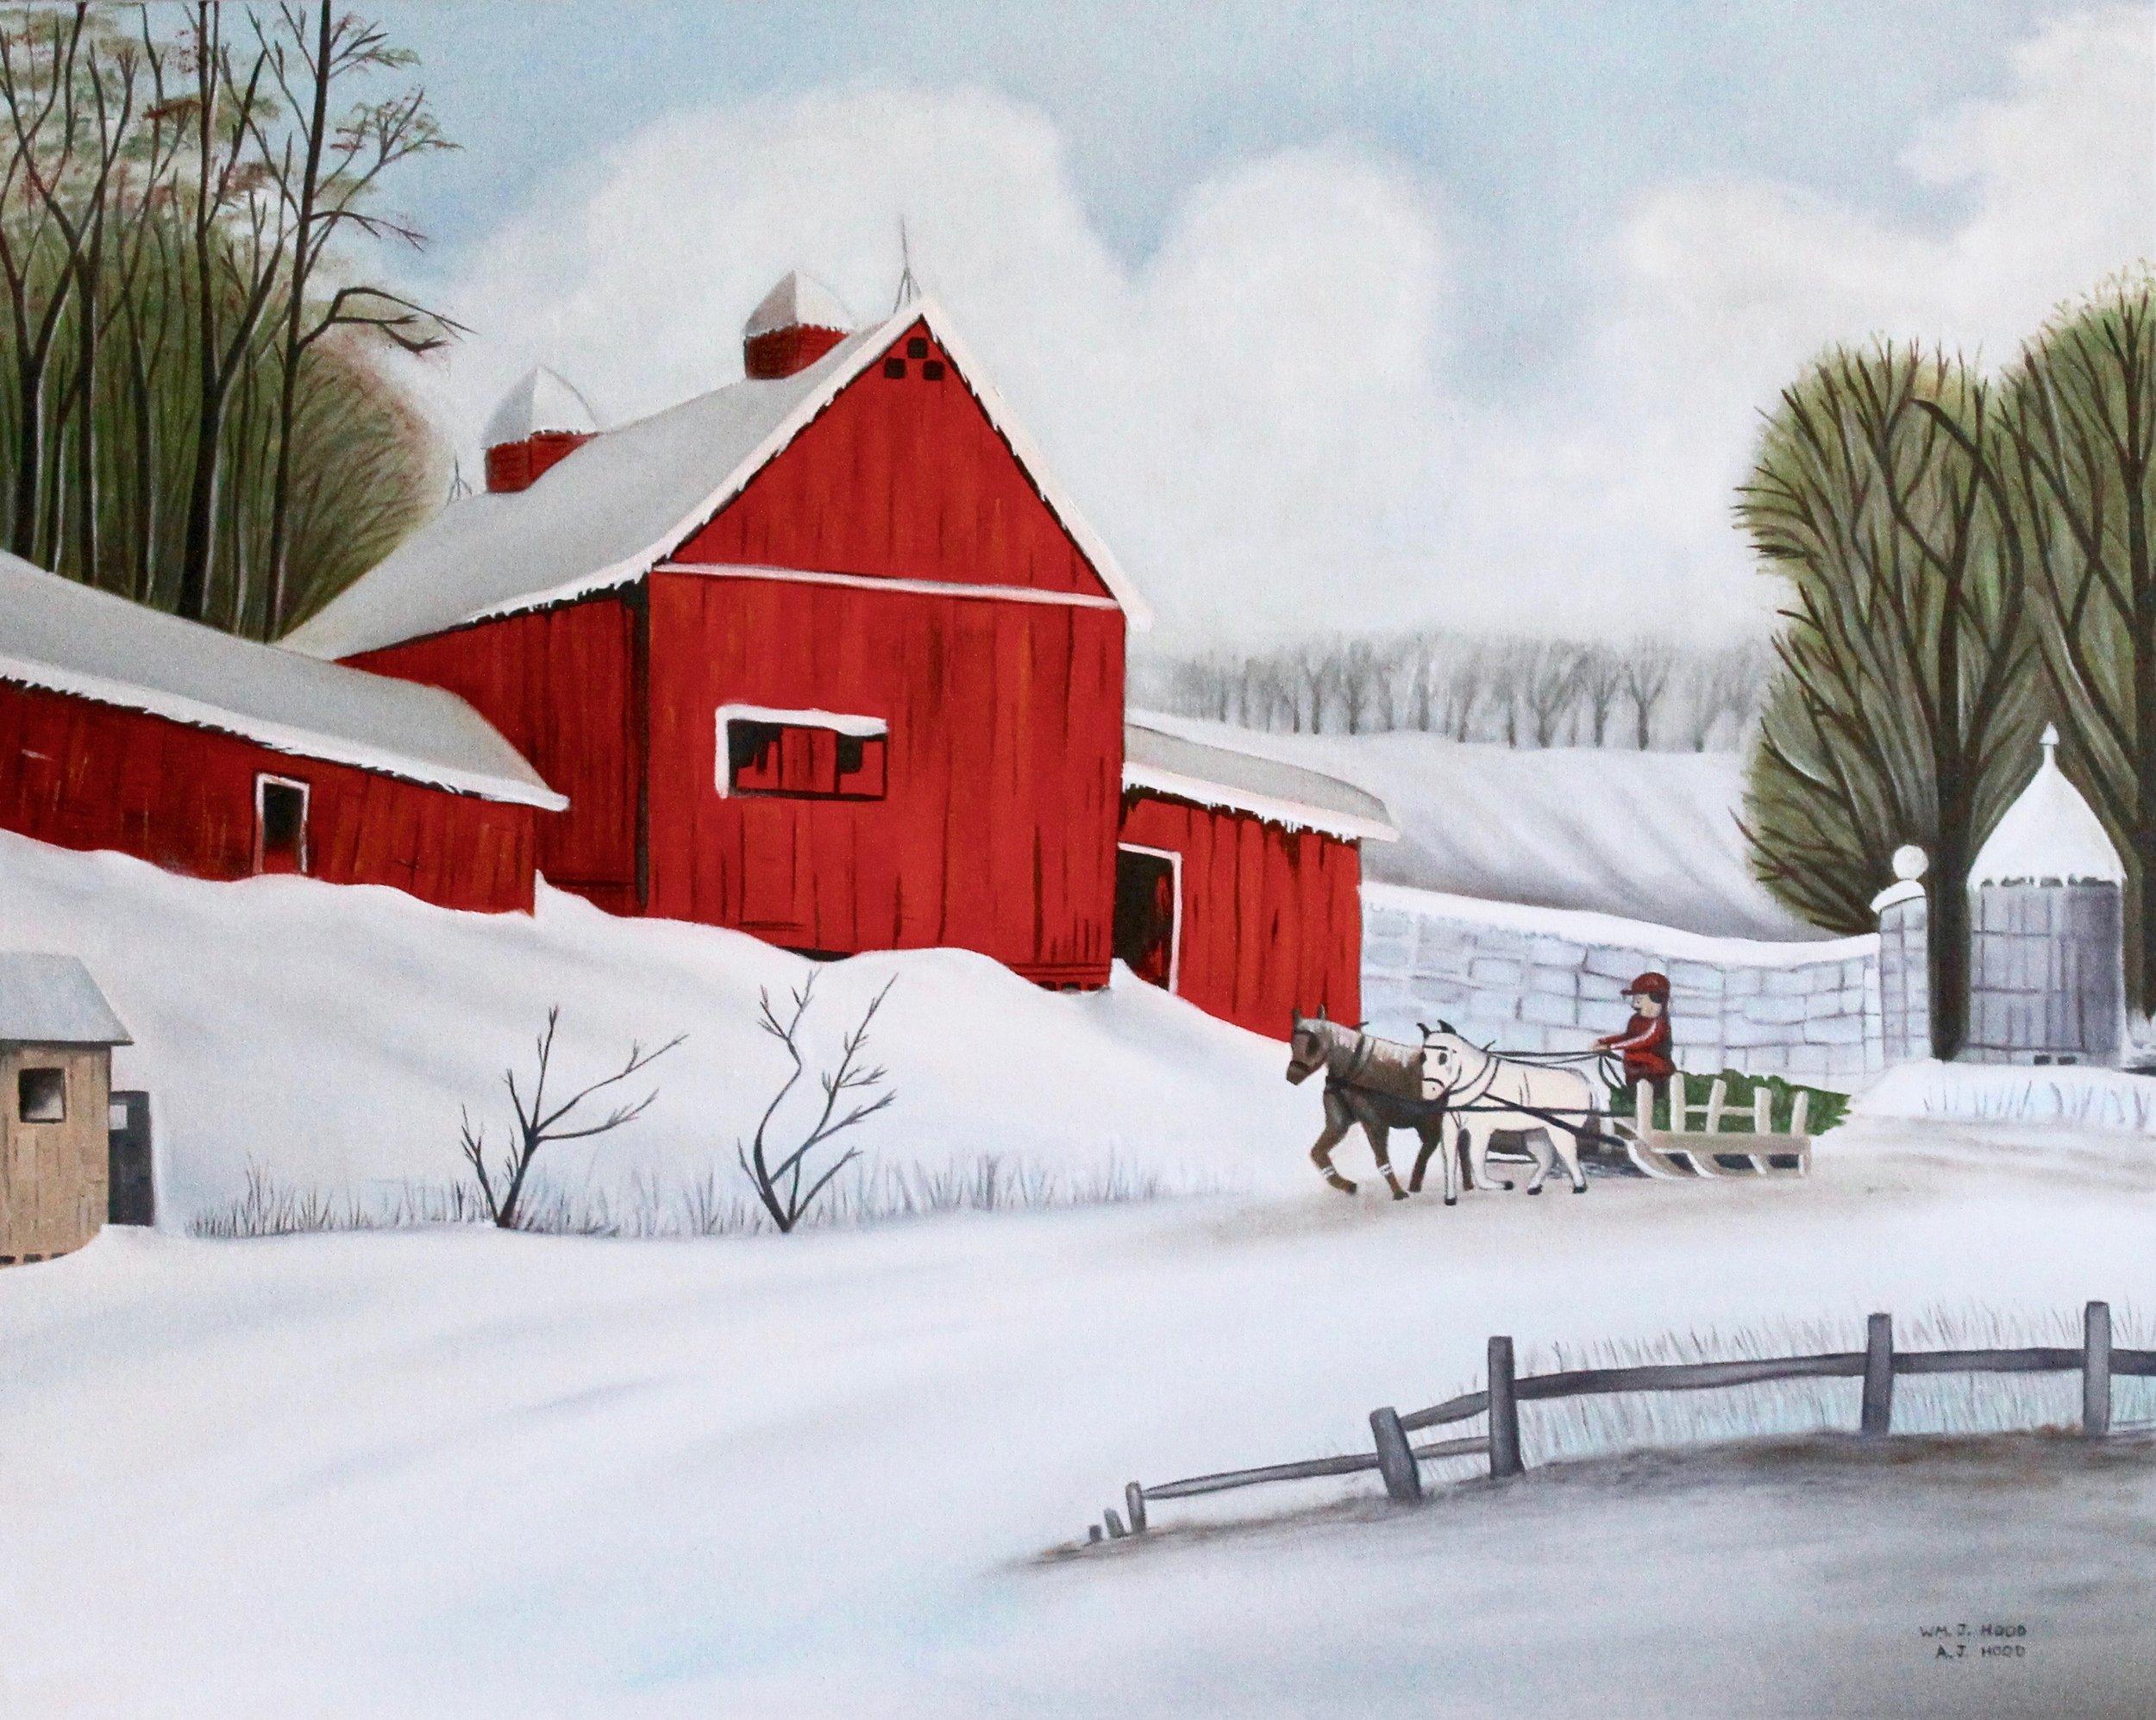 Red Barn Recreation